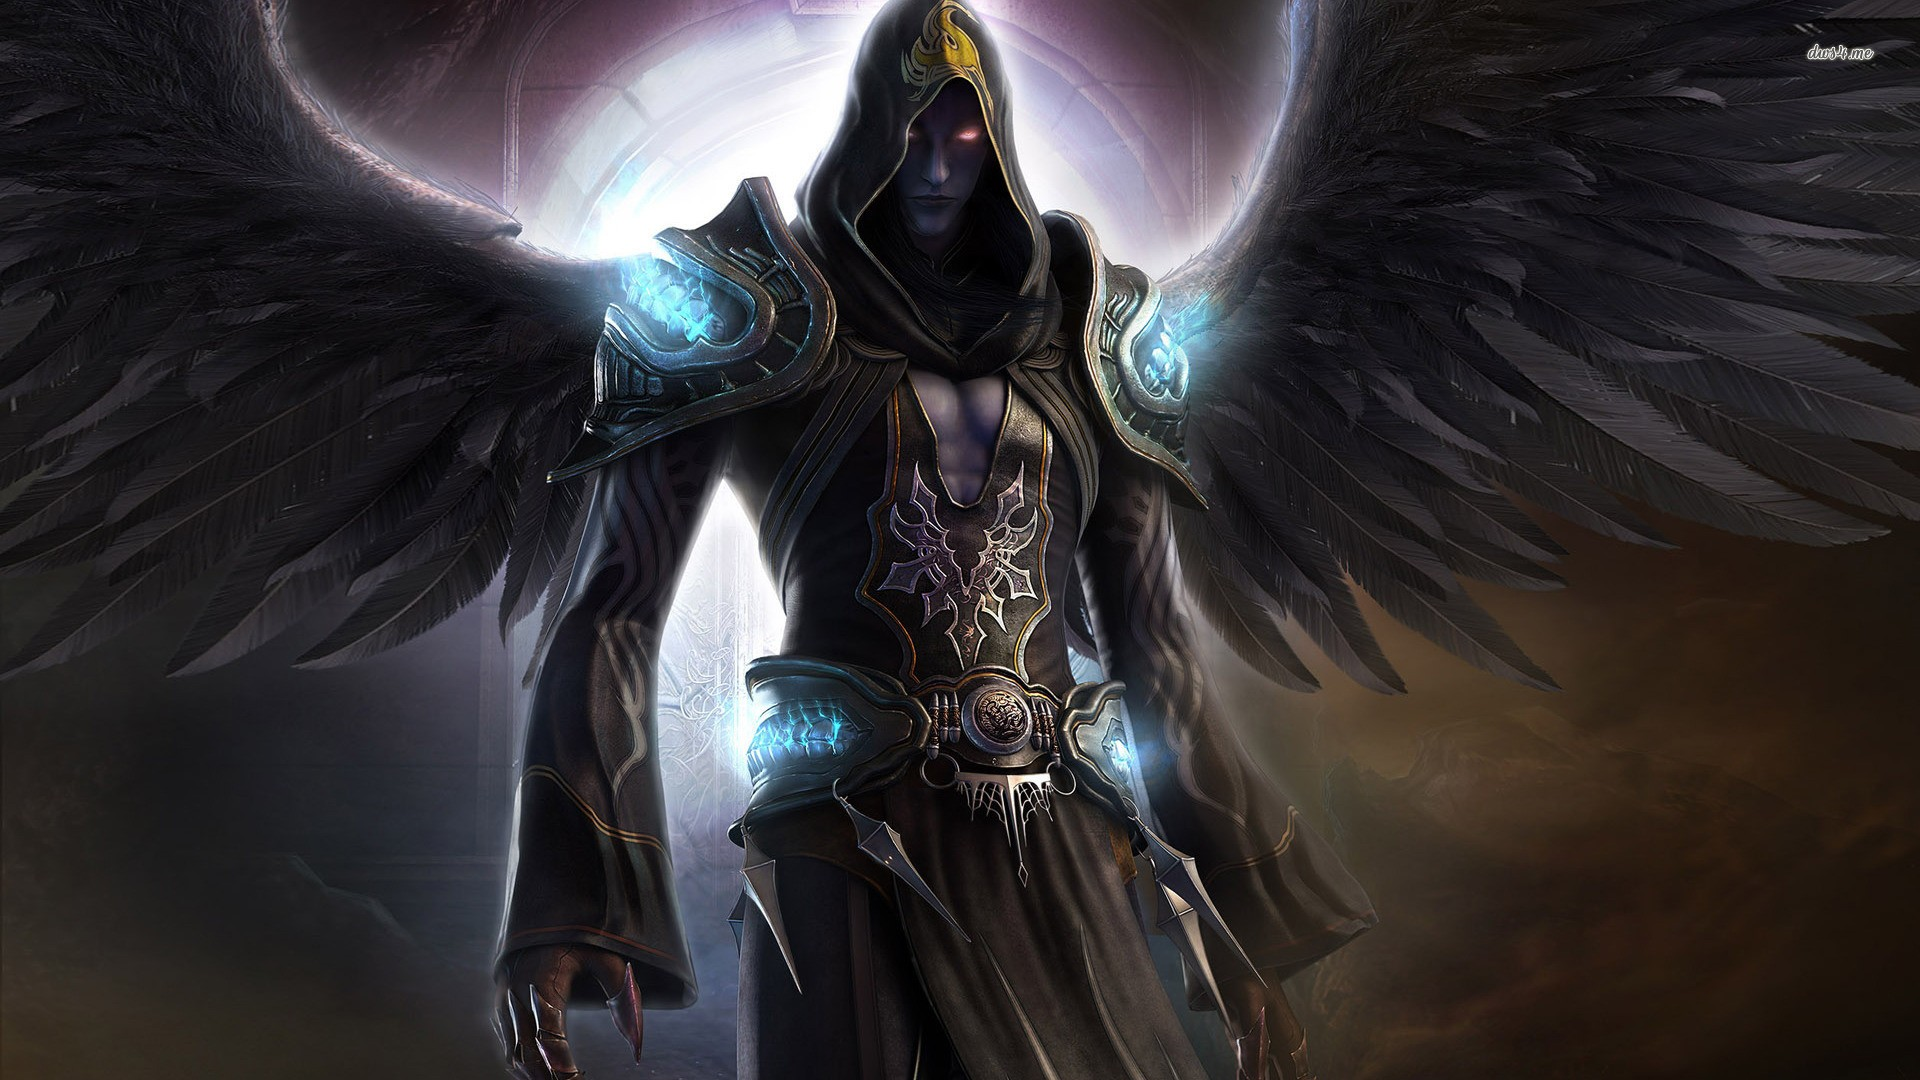 General 1920x1080 Dark Angel wings dark fantasy magician force angel red eyes Night Shadow Last Chaos